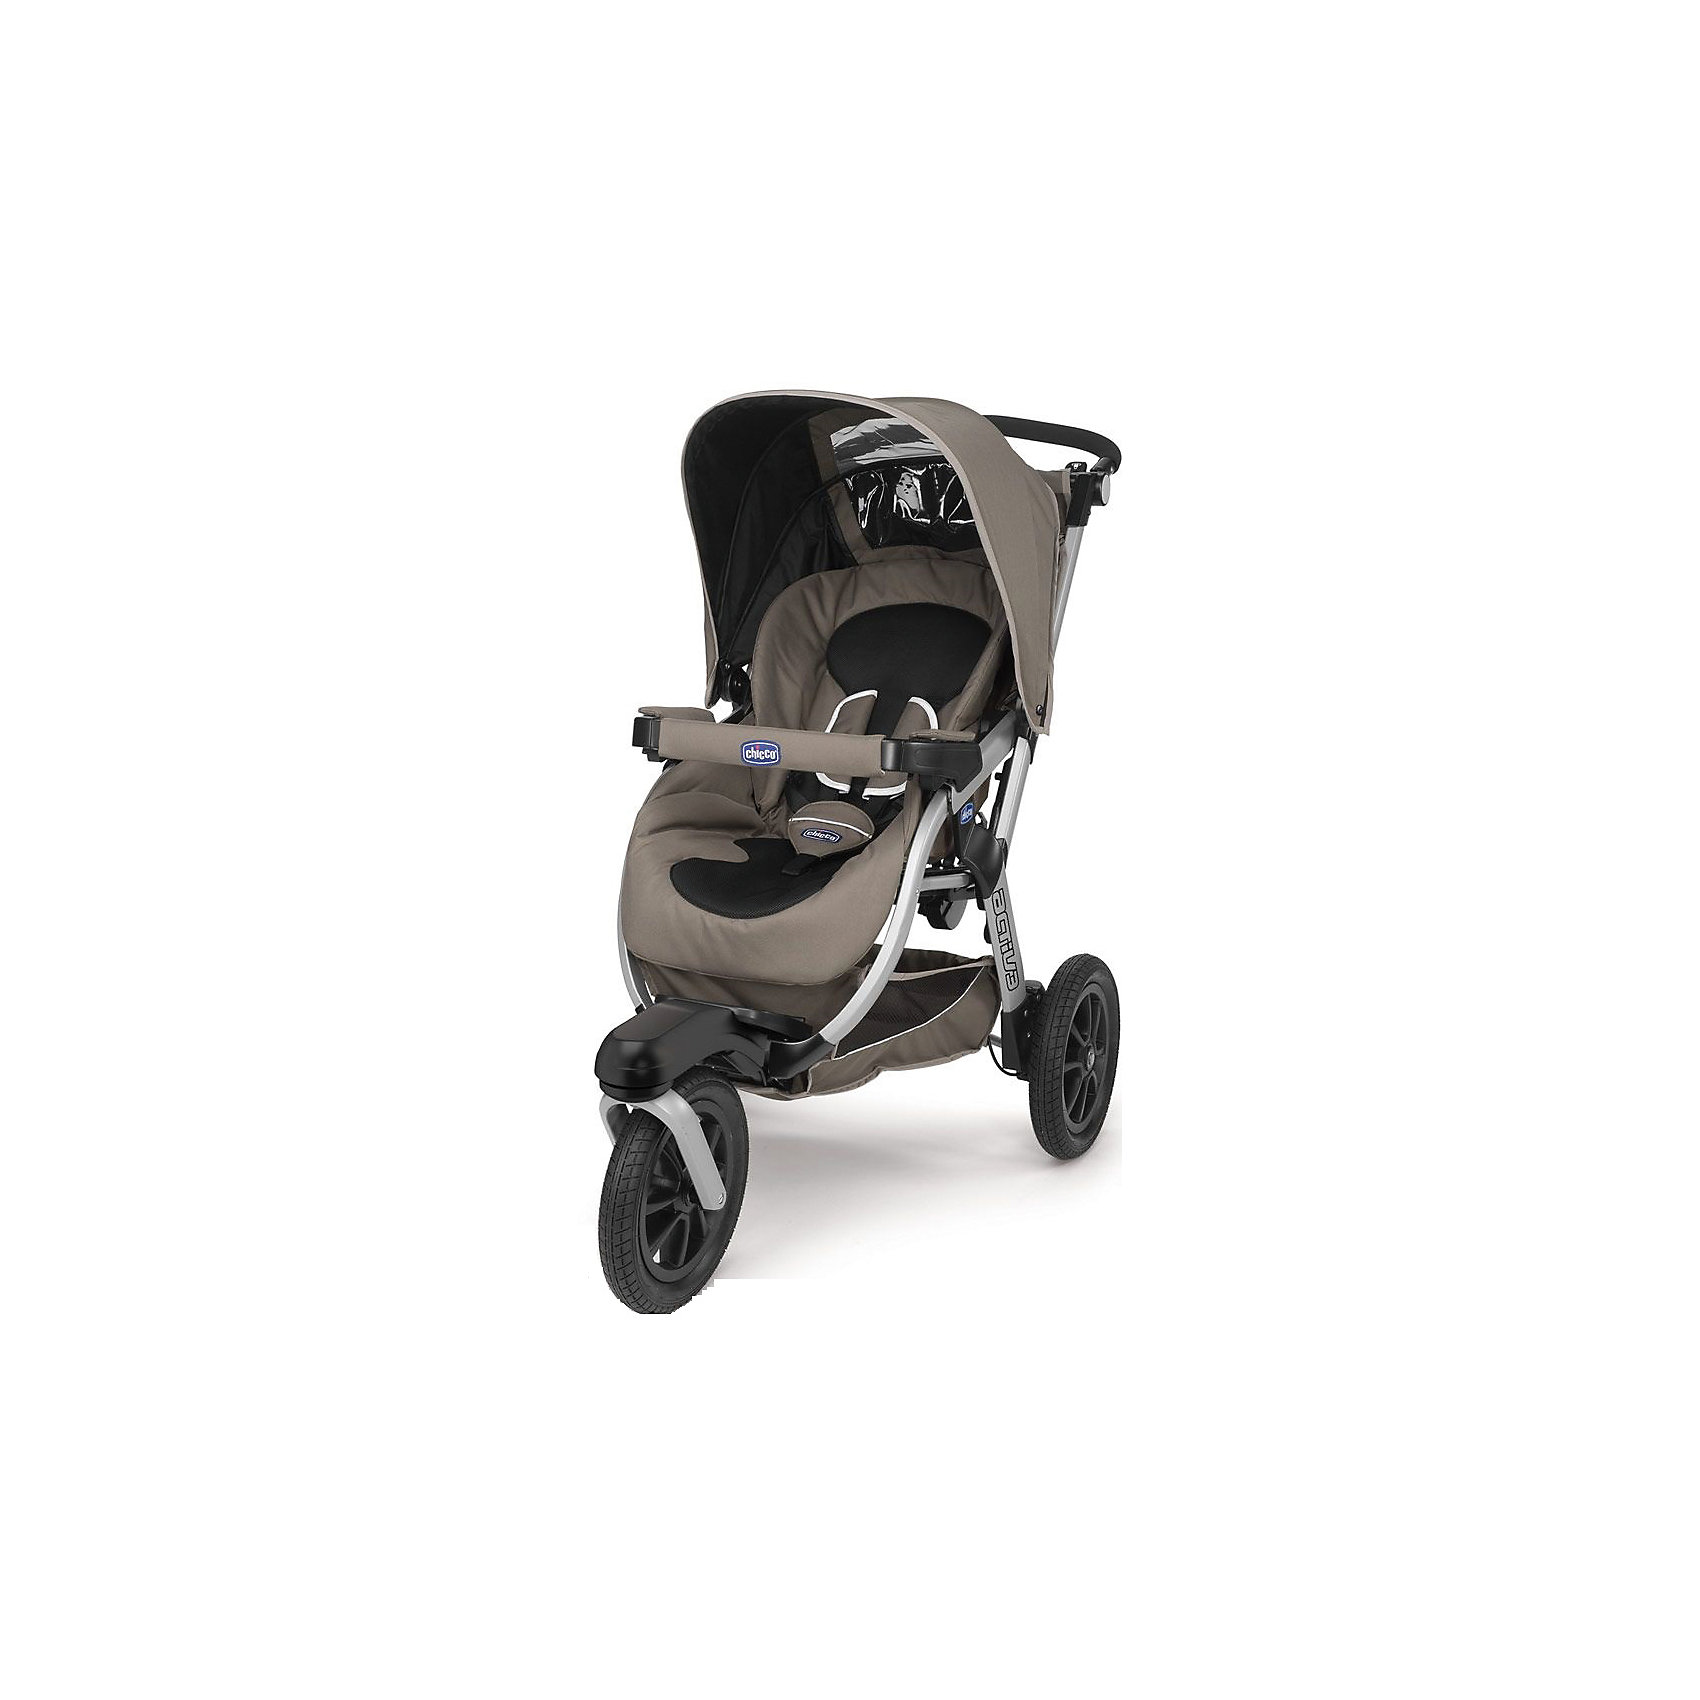 CHICCO Прогулочная коляска Activ3 3-W, CHICCO, бежевый прогулочная коляска chicco activ3 grey